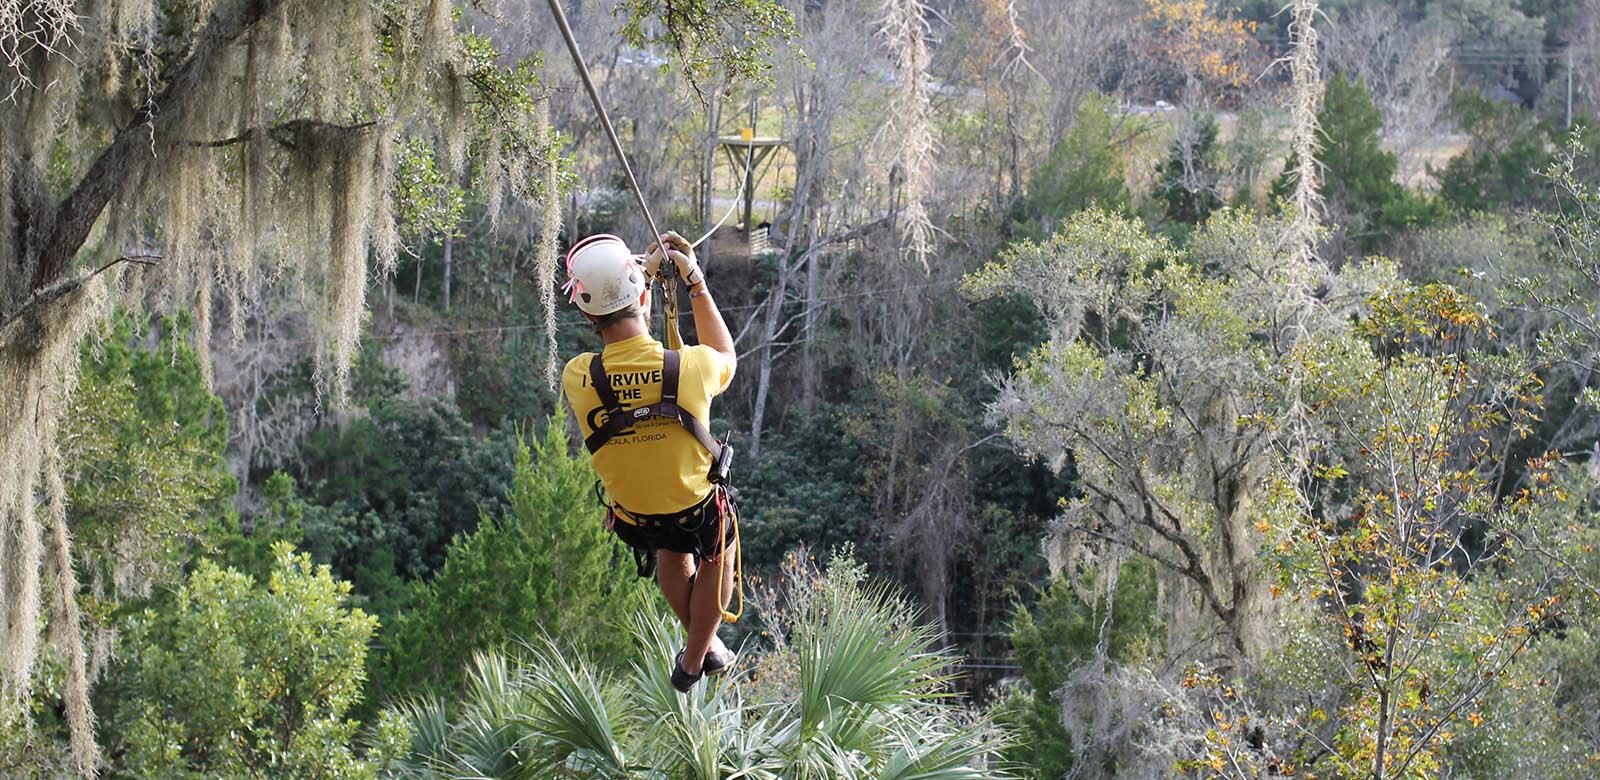 Canyon Zipline Tour Wilderness